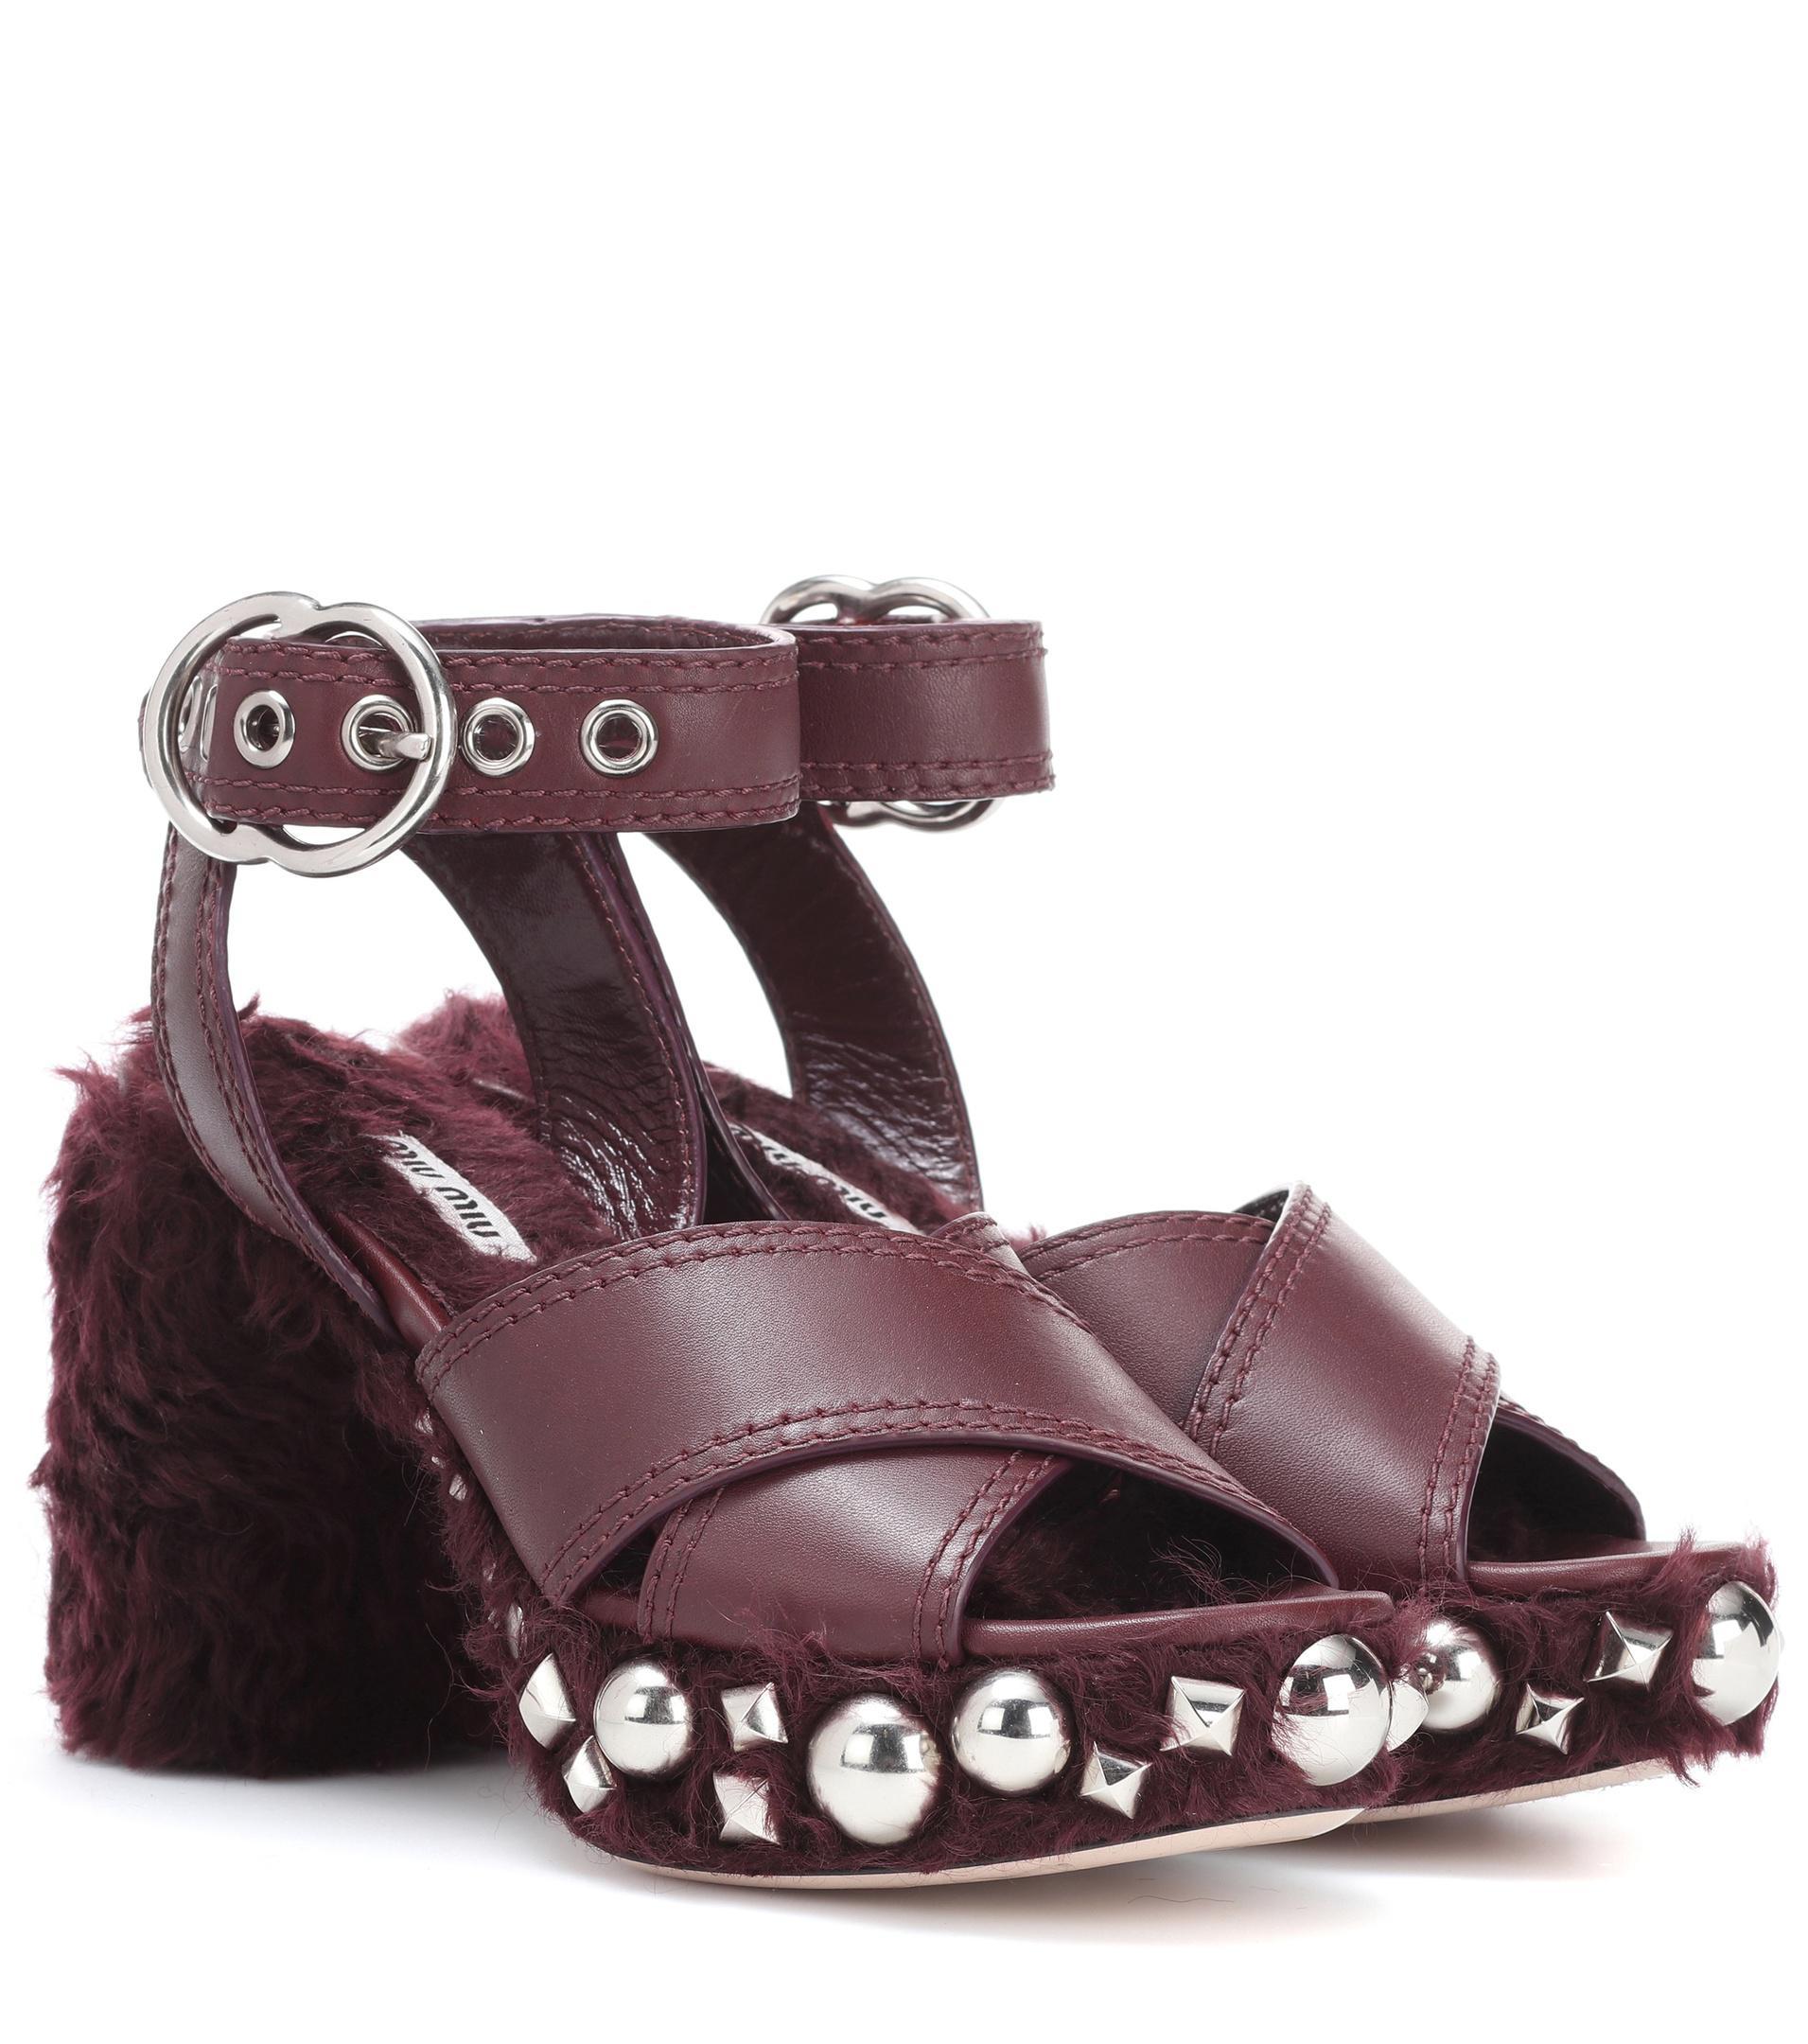 Miu Miu Leather and faux fur sandals KSN1An6G